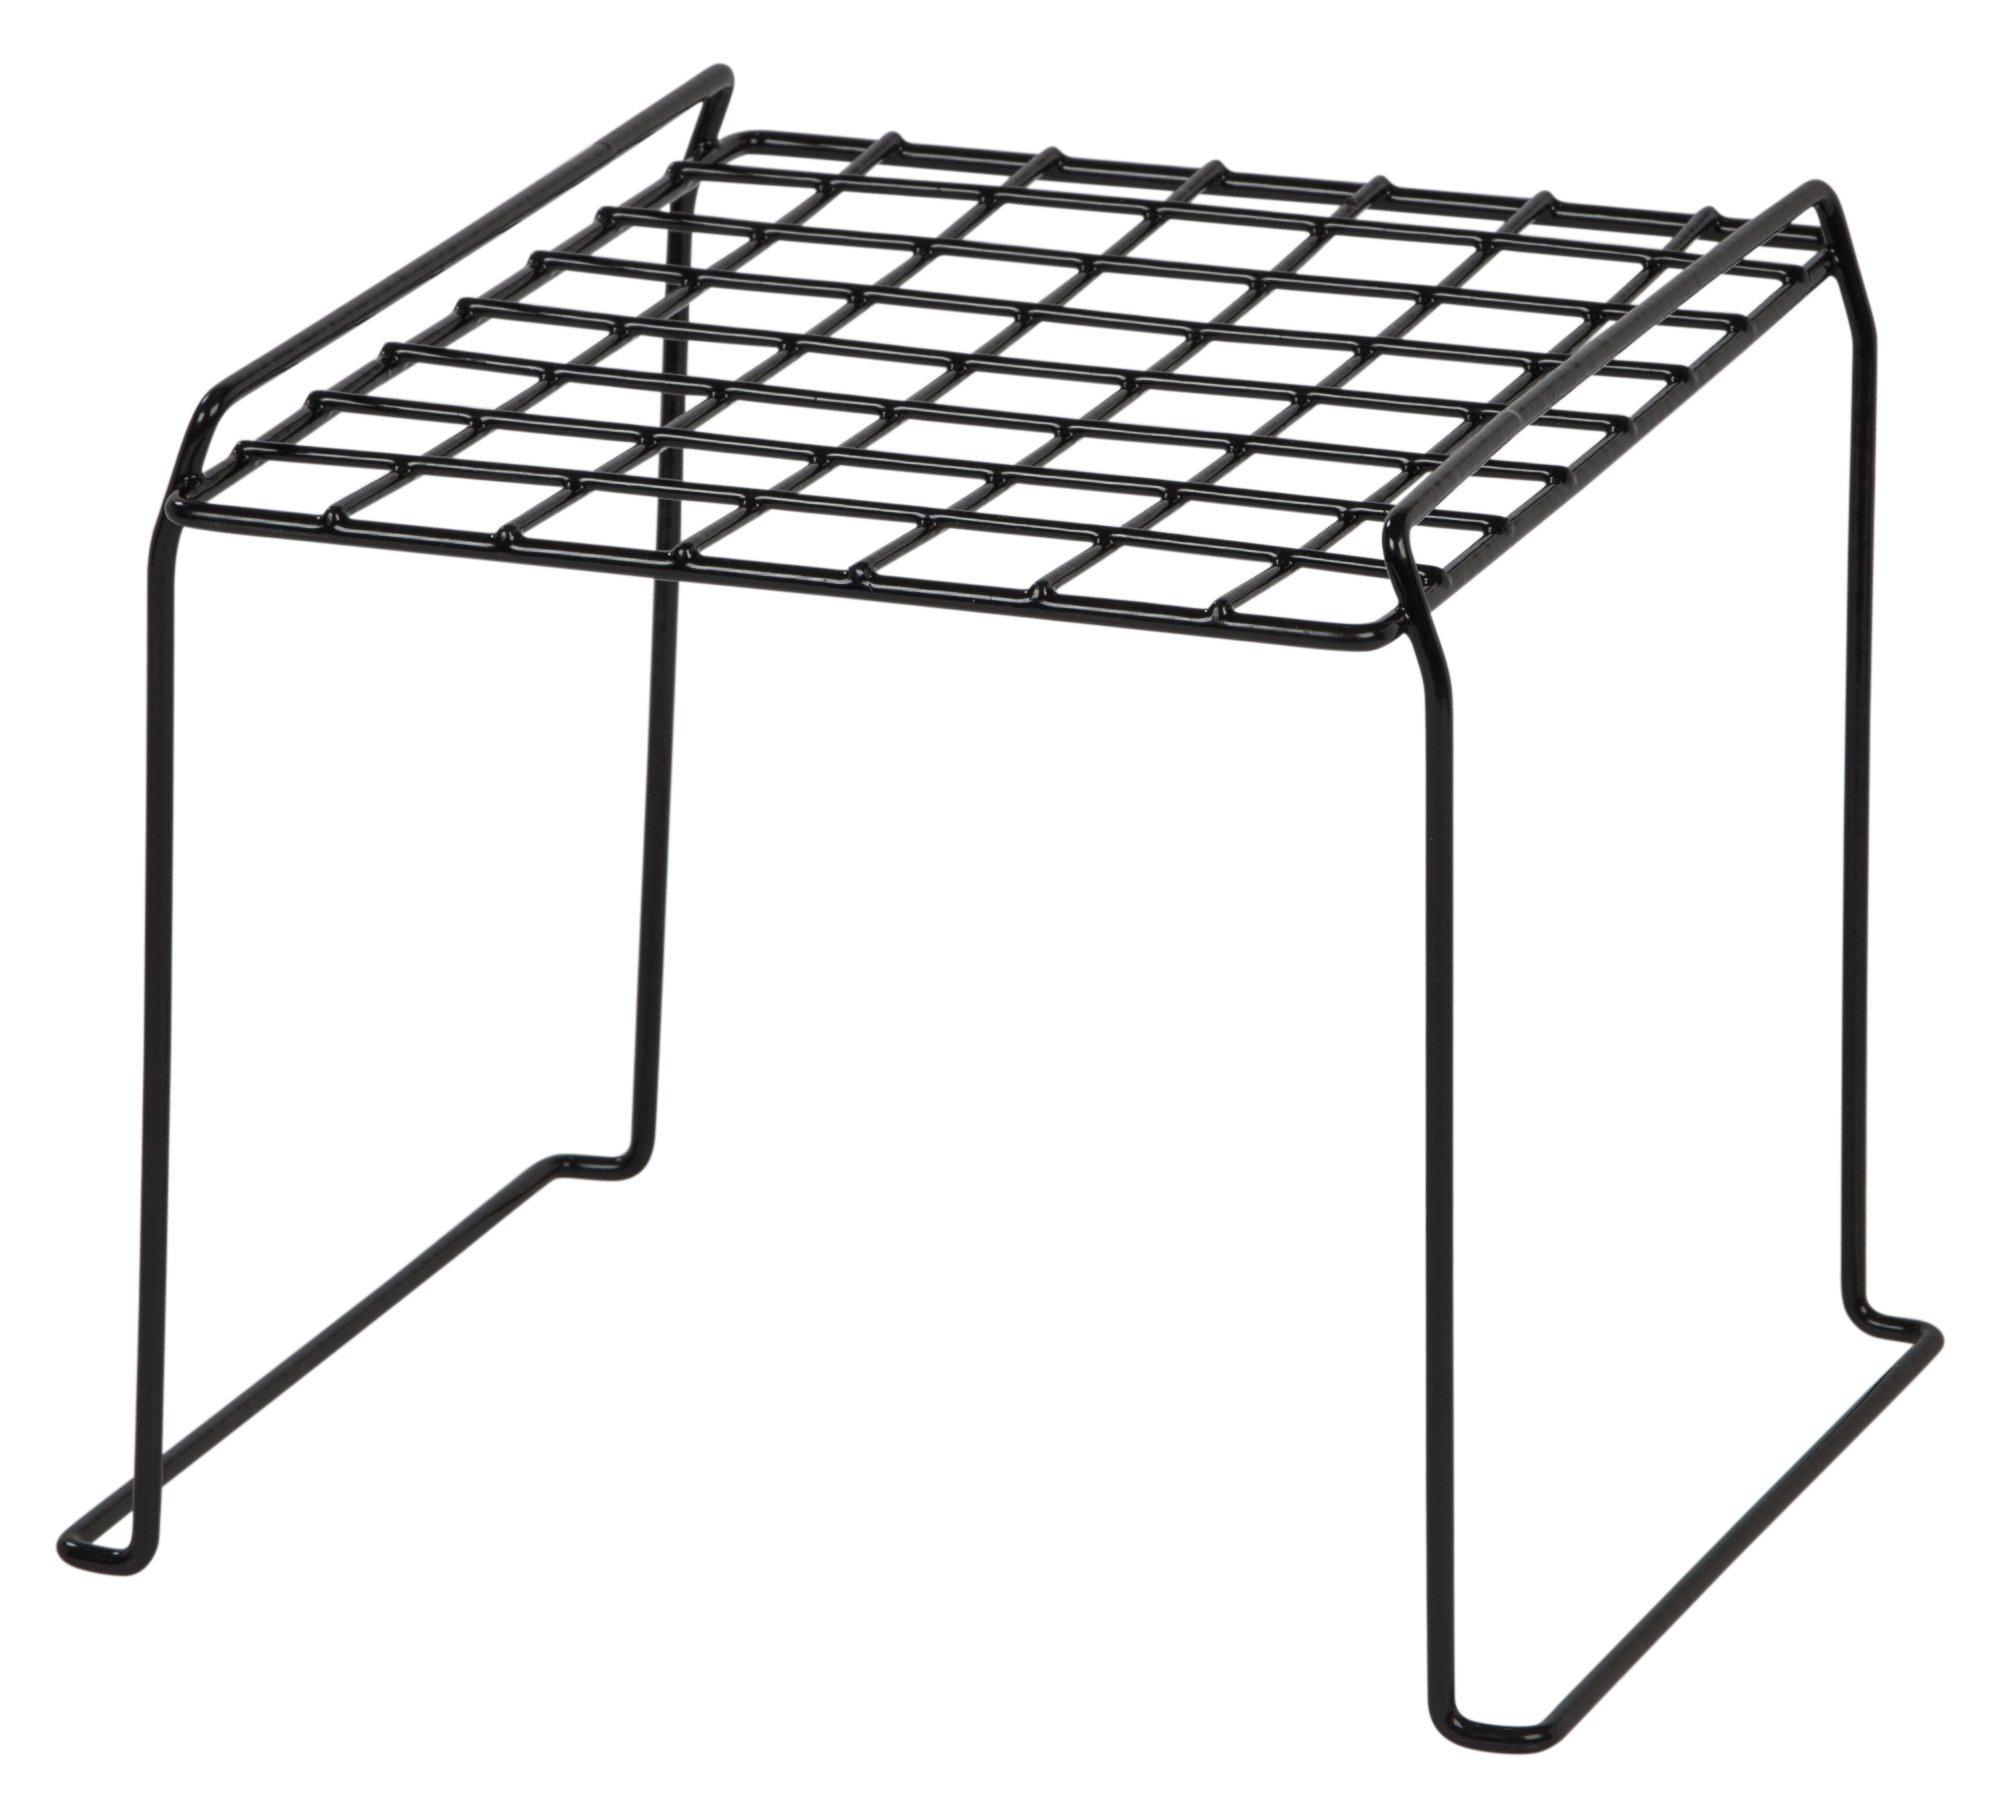 IRIS 8-inch Stackable Wire Locker Shelf, 4-pack, Black